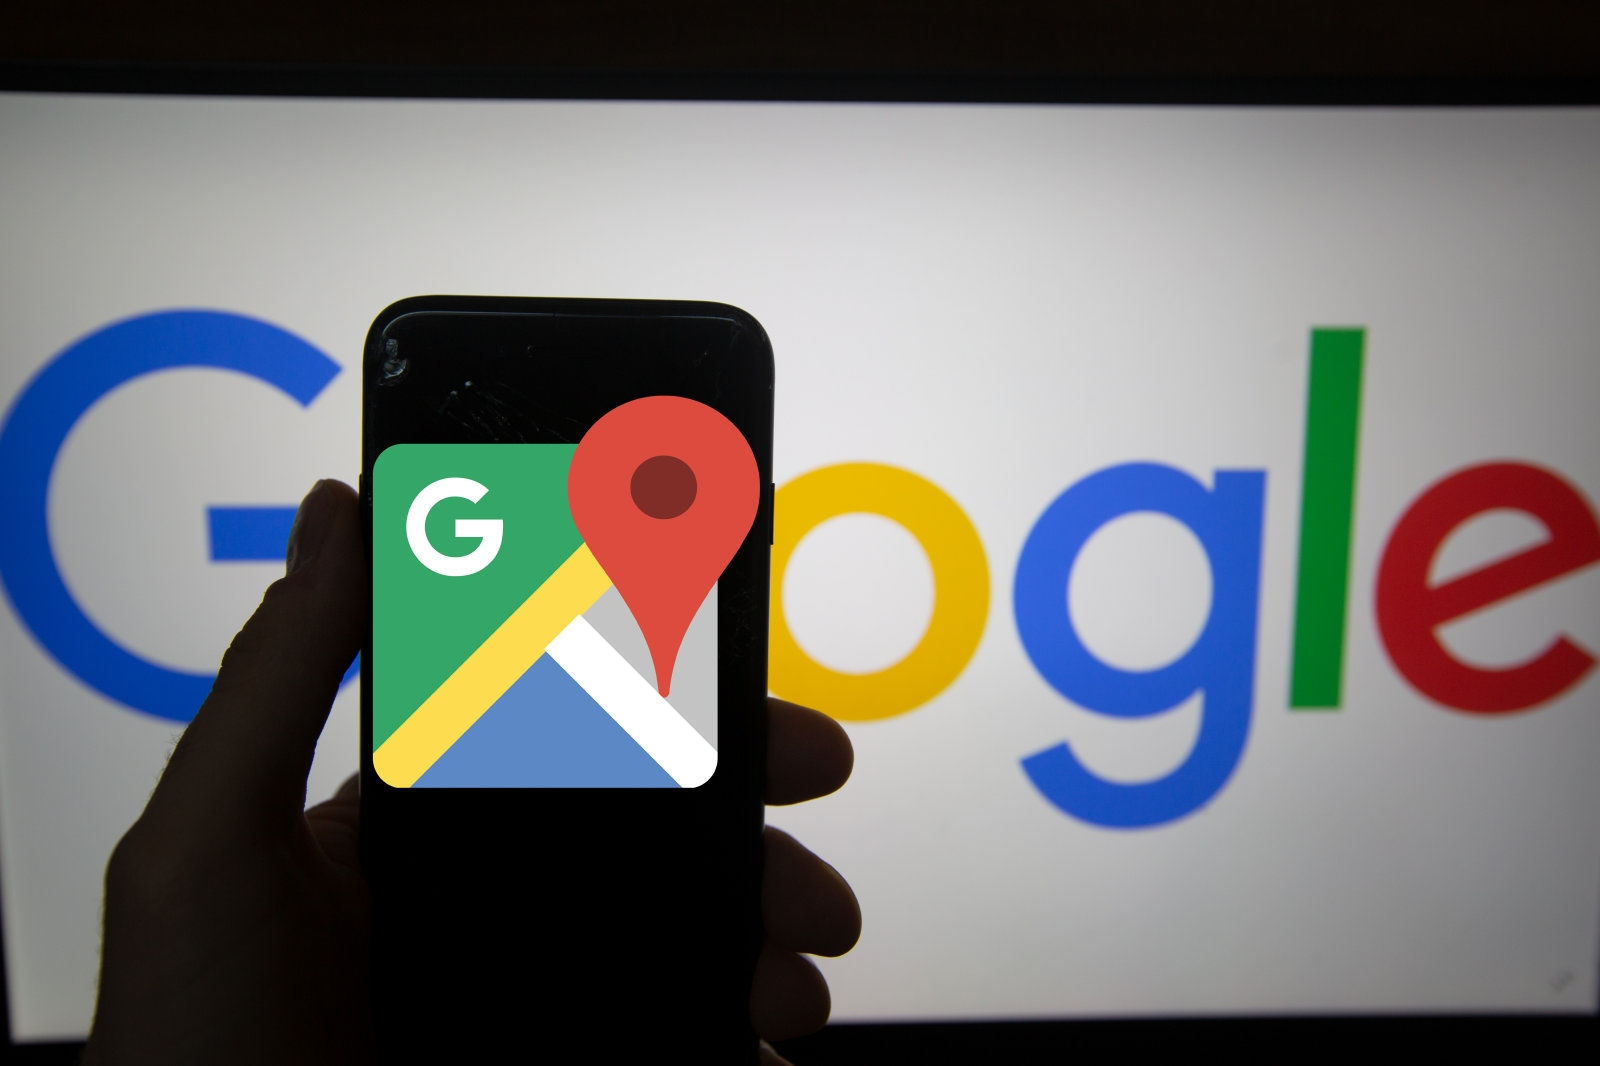 Apple 'temporarily' blocks Google's internal iOS apps, too | DeviceDaily.com